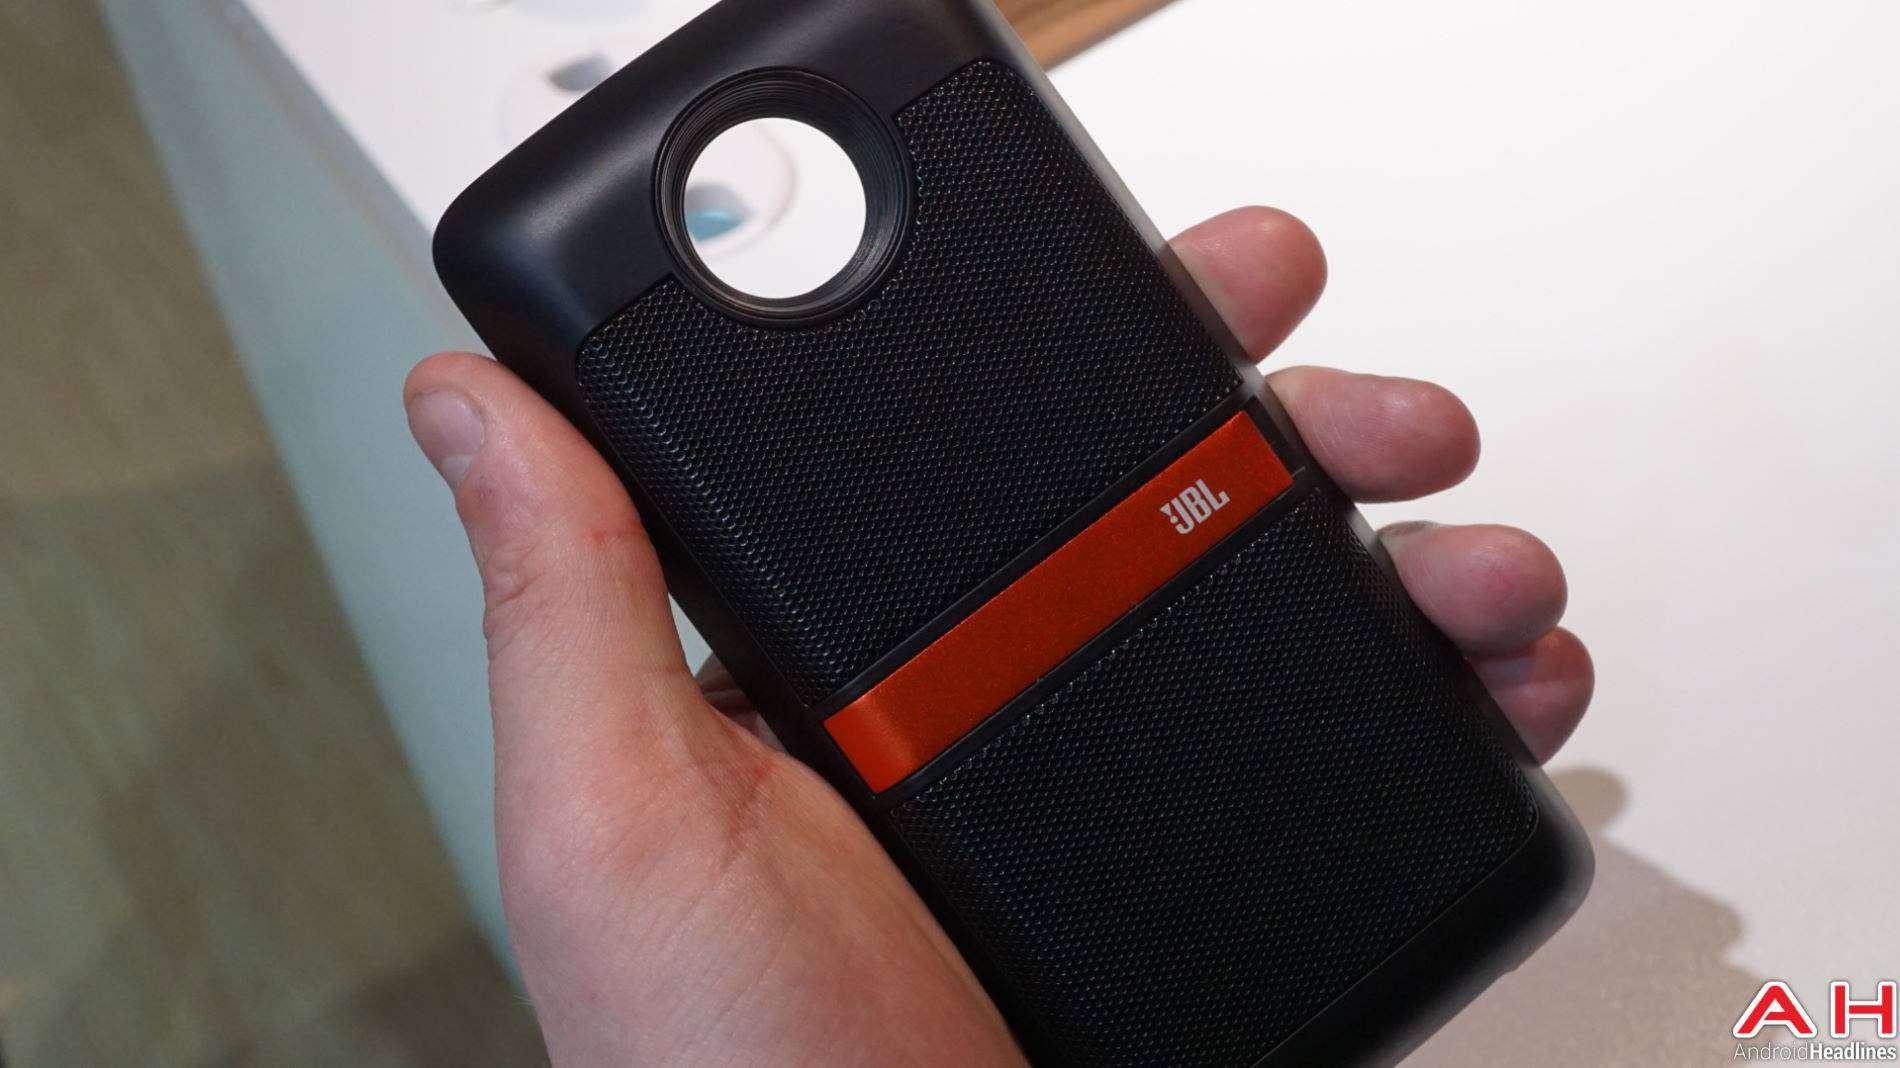 JBL Moto Mods Lenovo Hands On AH 3 7